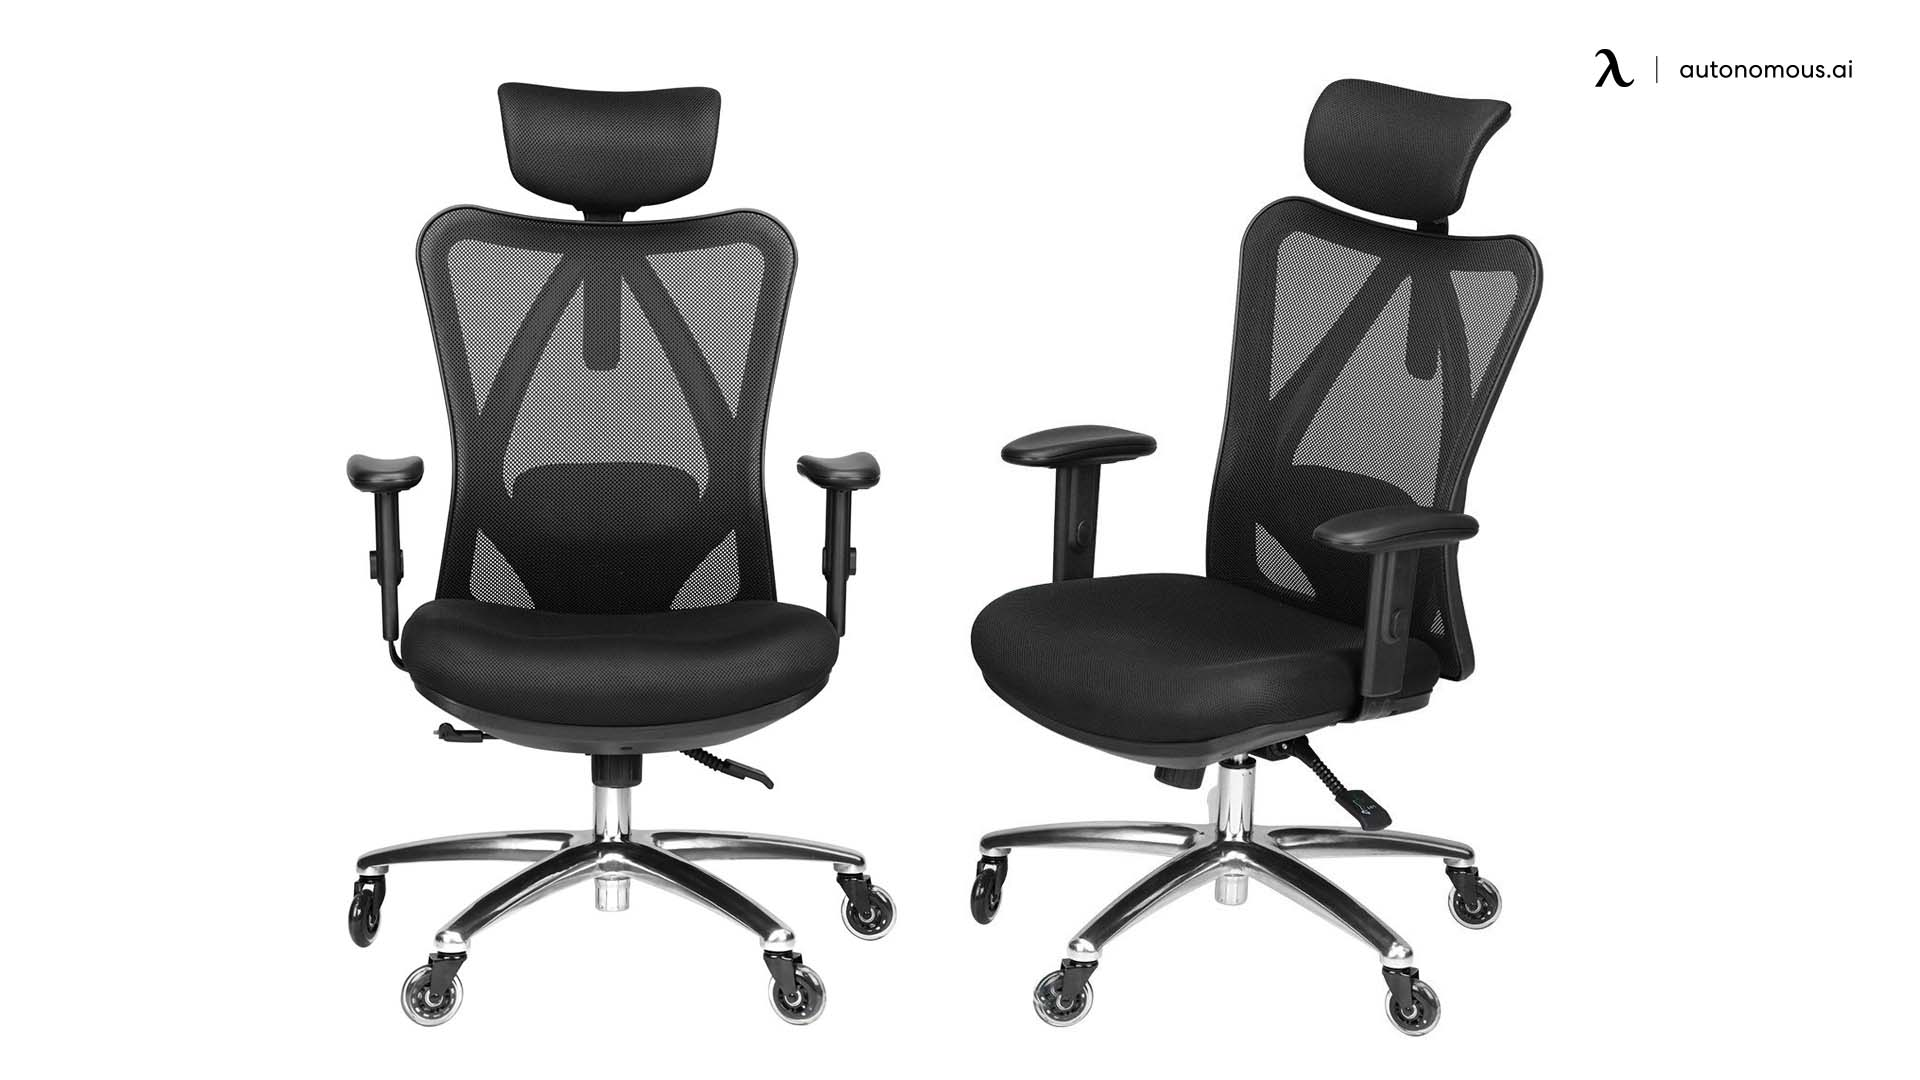 Duramont Ergonomic Adjustable chair